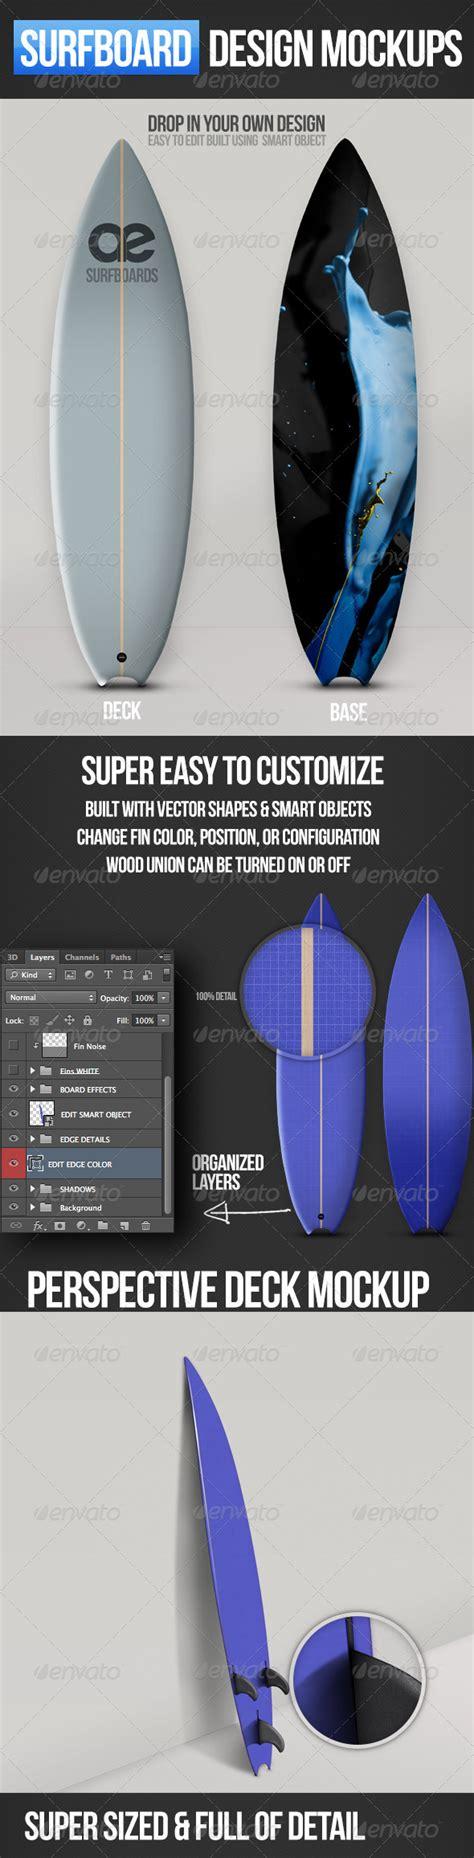 mockup design layout surfboard mockups surfboards mockup and design layouts